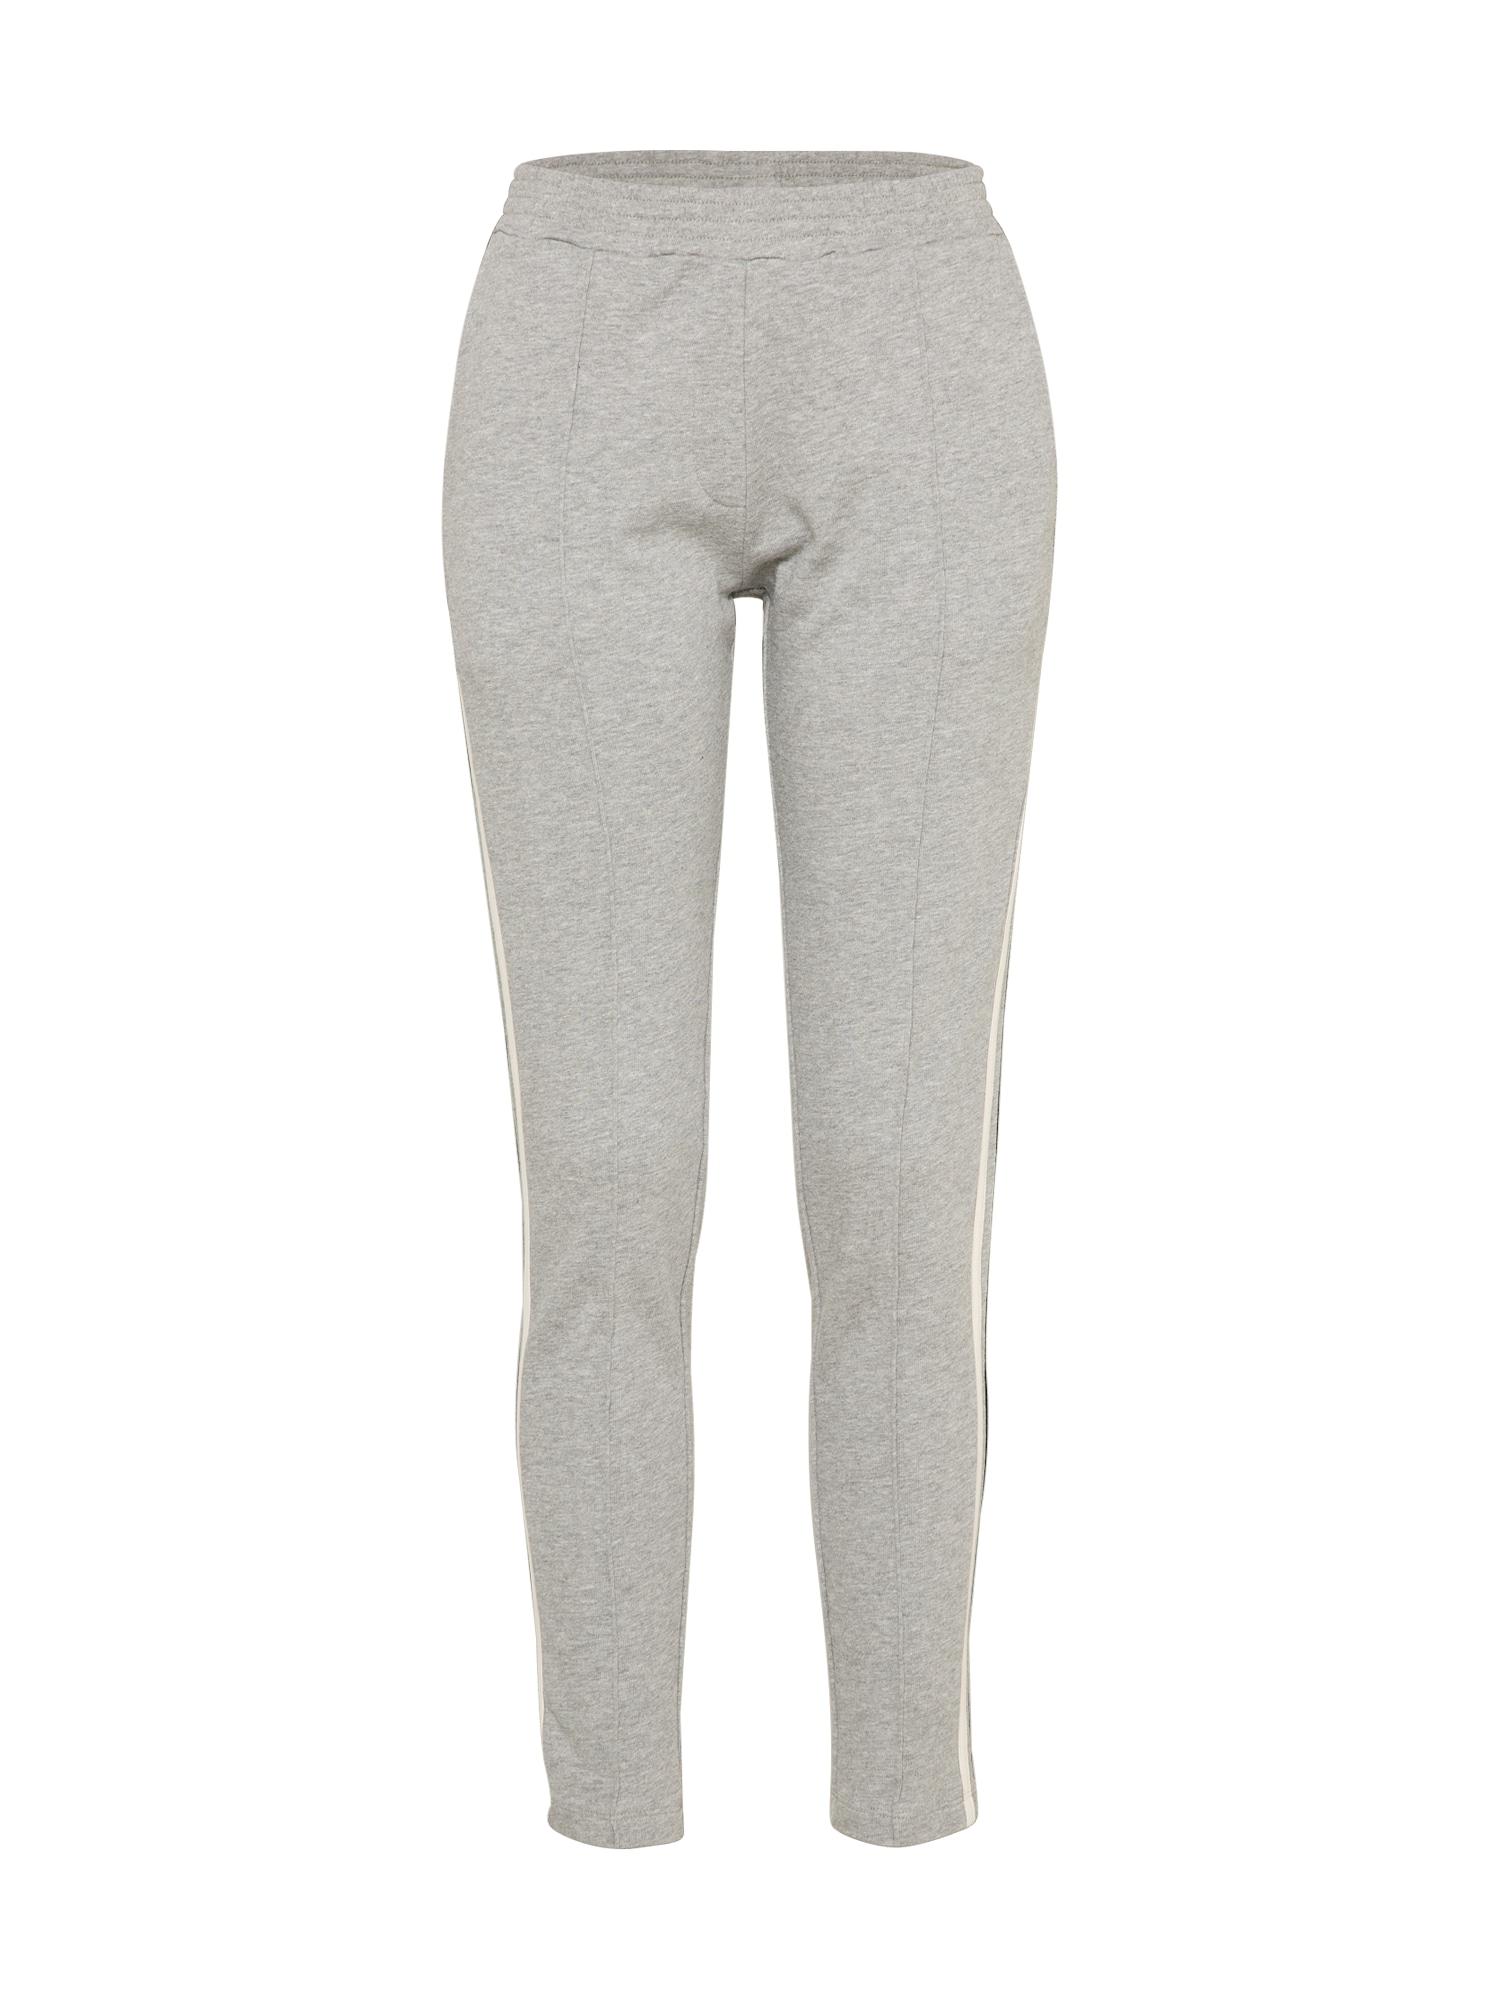 Kalhoty se sklady v pase BIDA šedý melír VERO MODA